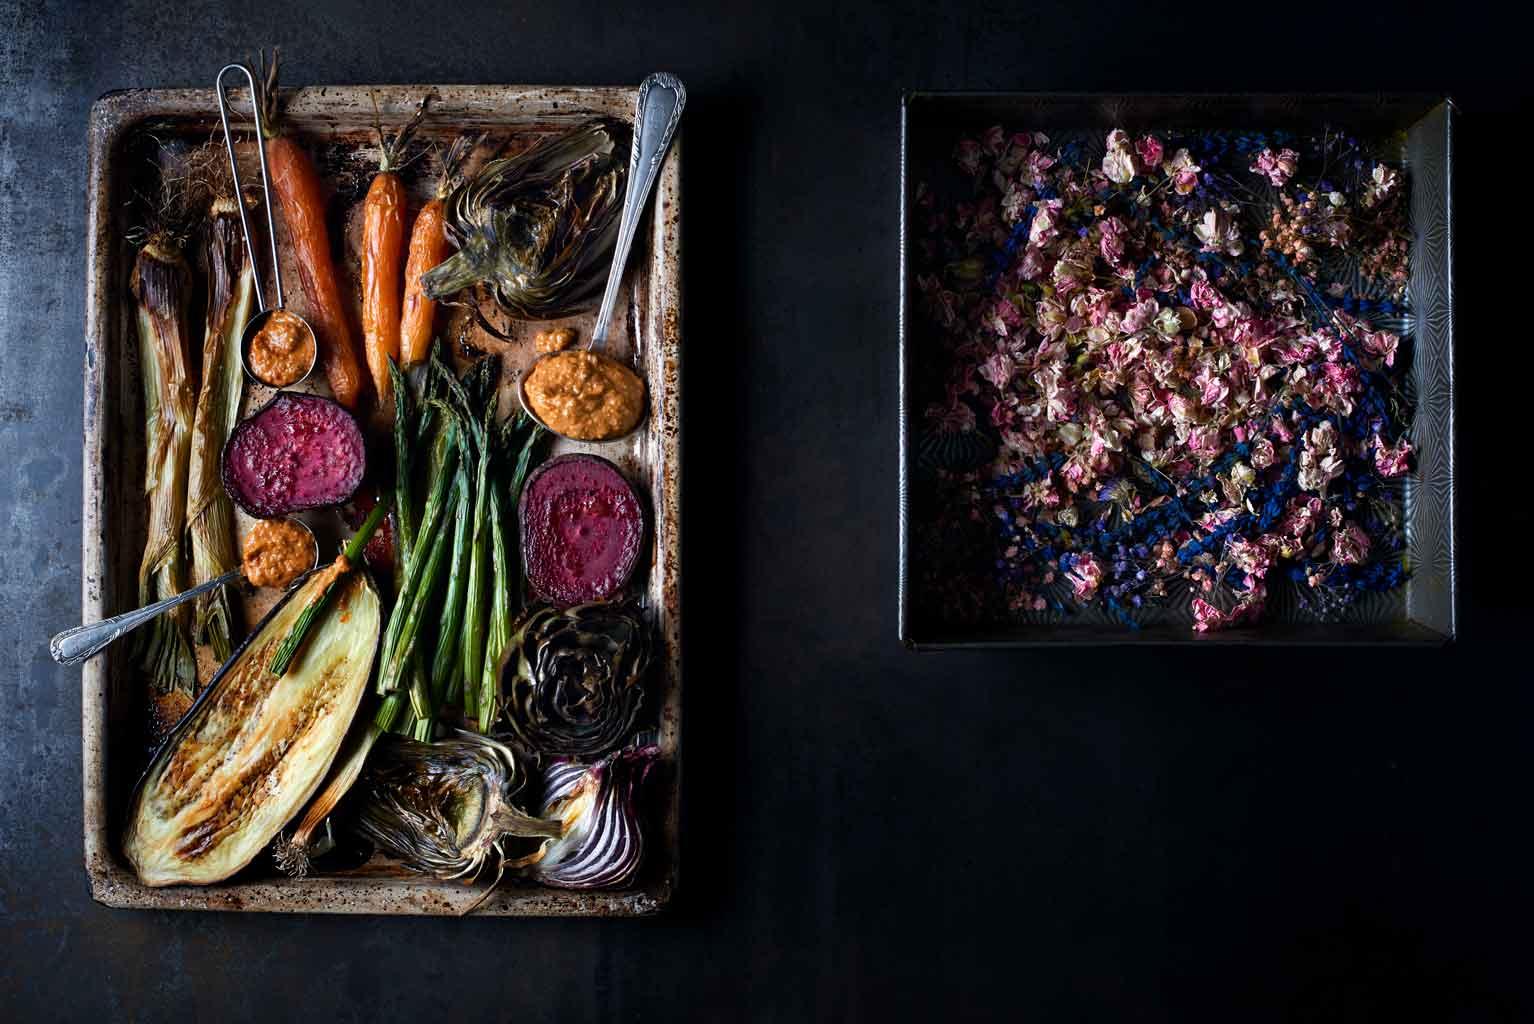 forfood-miri-masterchef-receta-editorial-home-economist-estudio-verduras